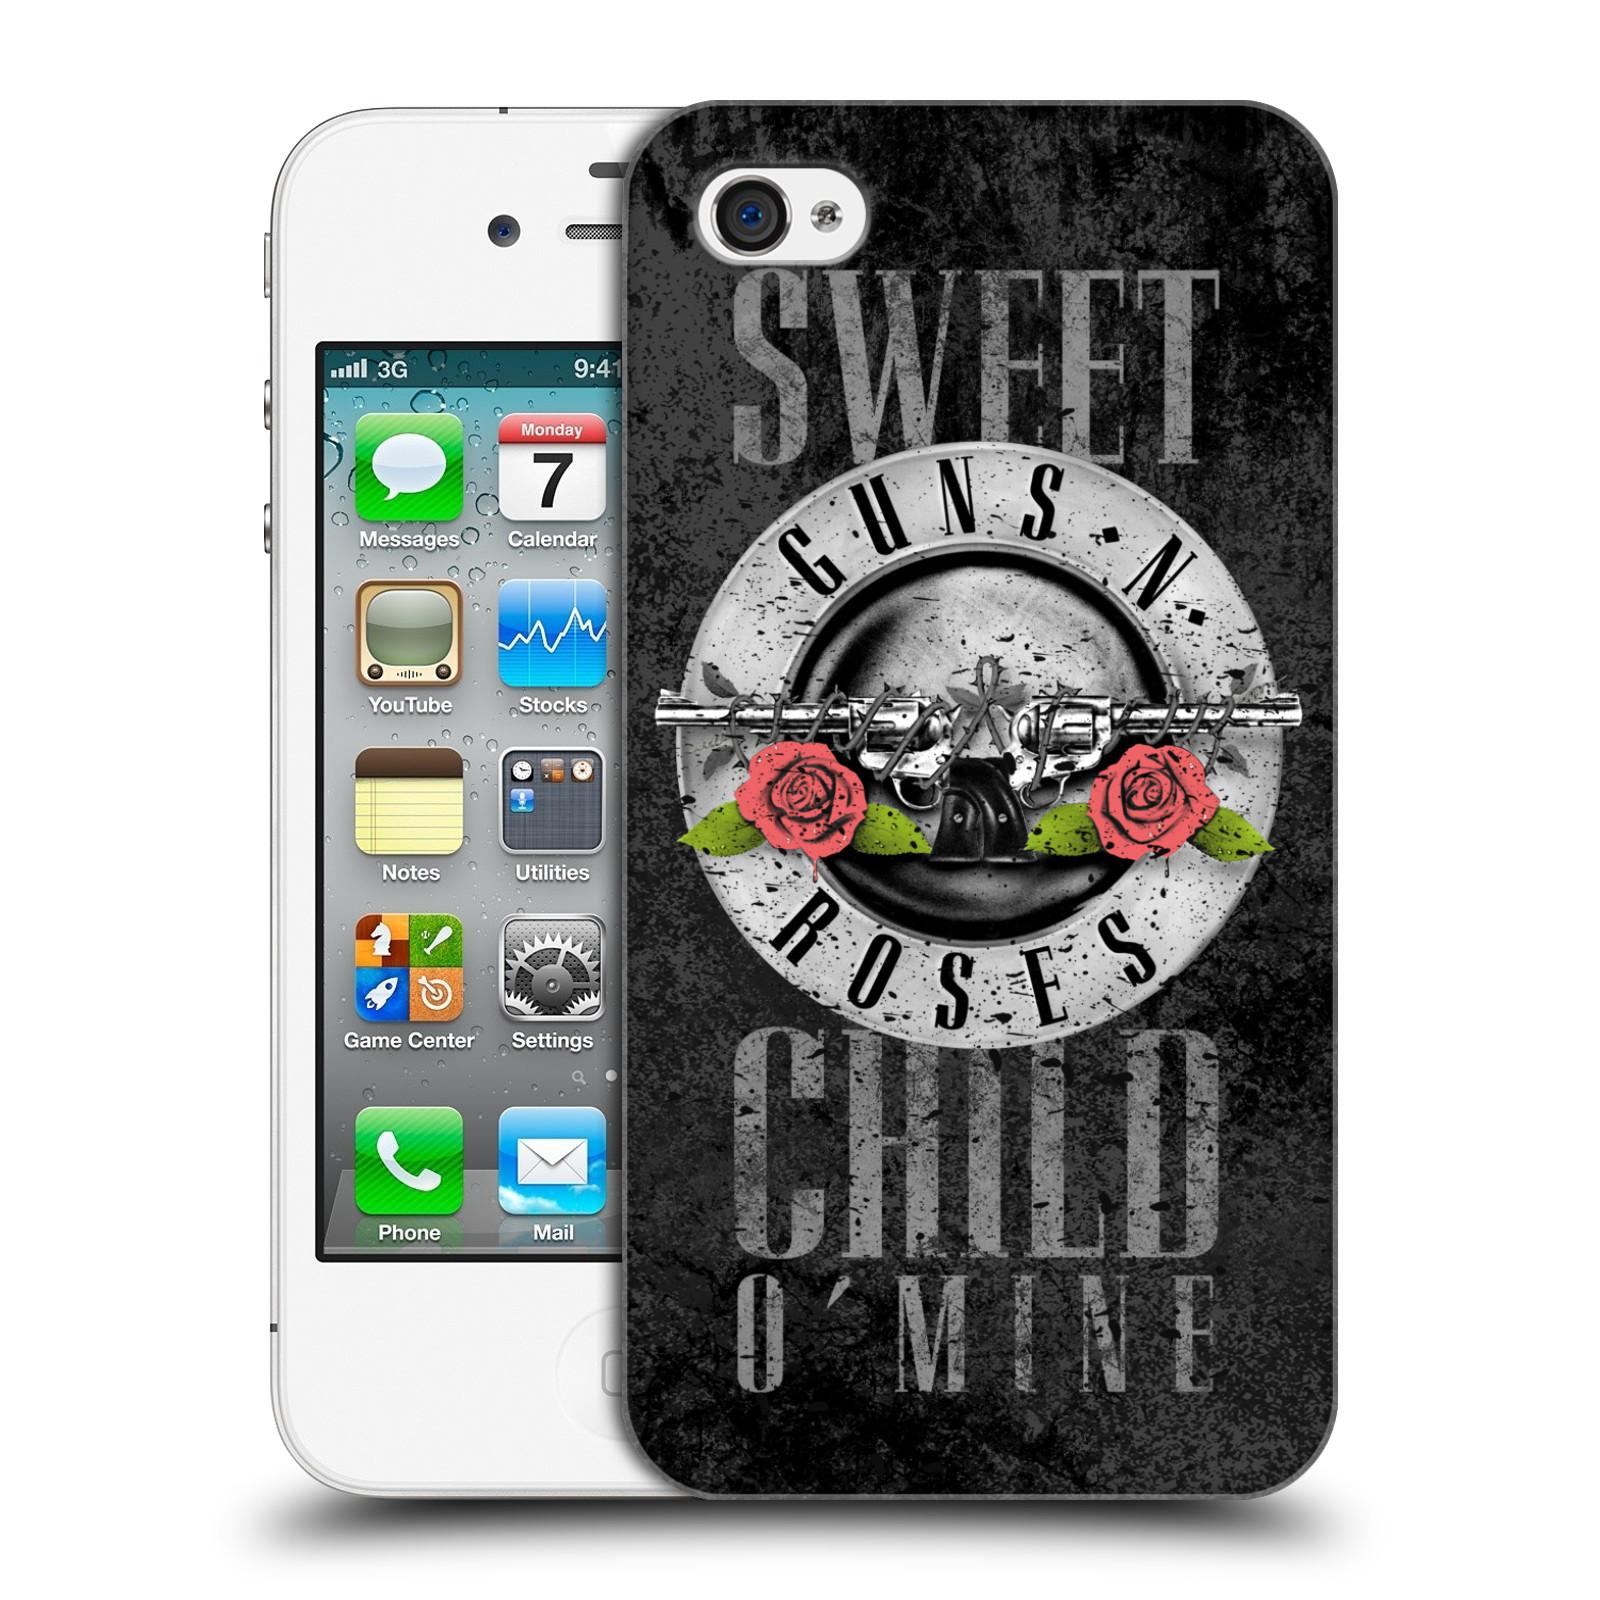 Plastové pouzdro na mobil Apple iPhone 4 a 4S HEAD CASE Guns N' Roses - Sweet Child